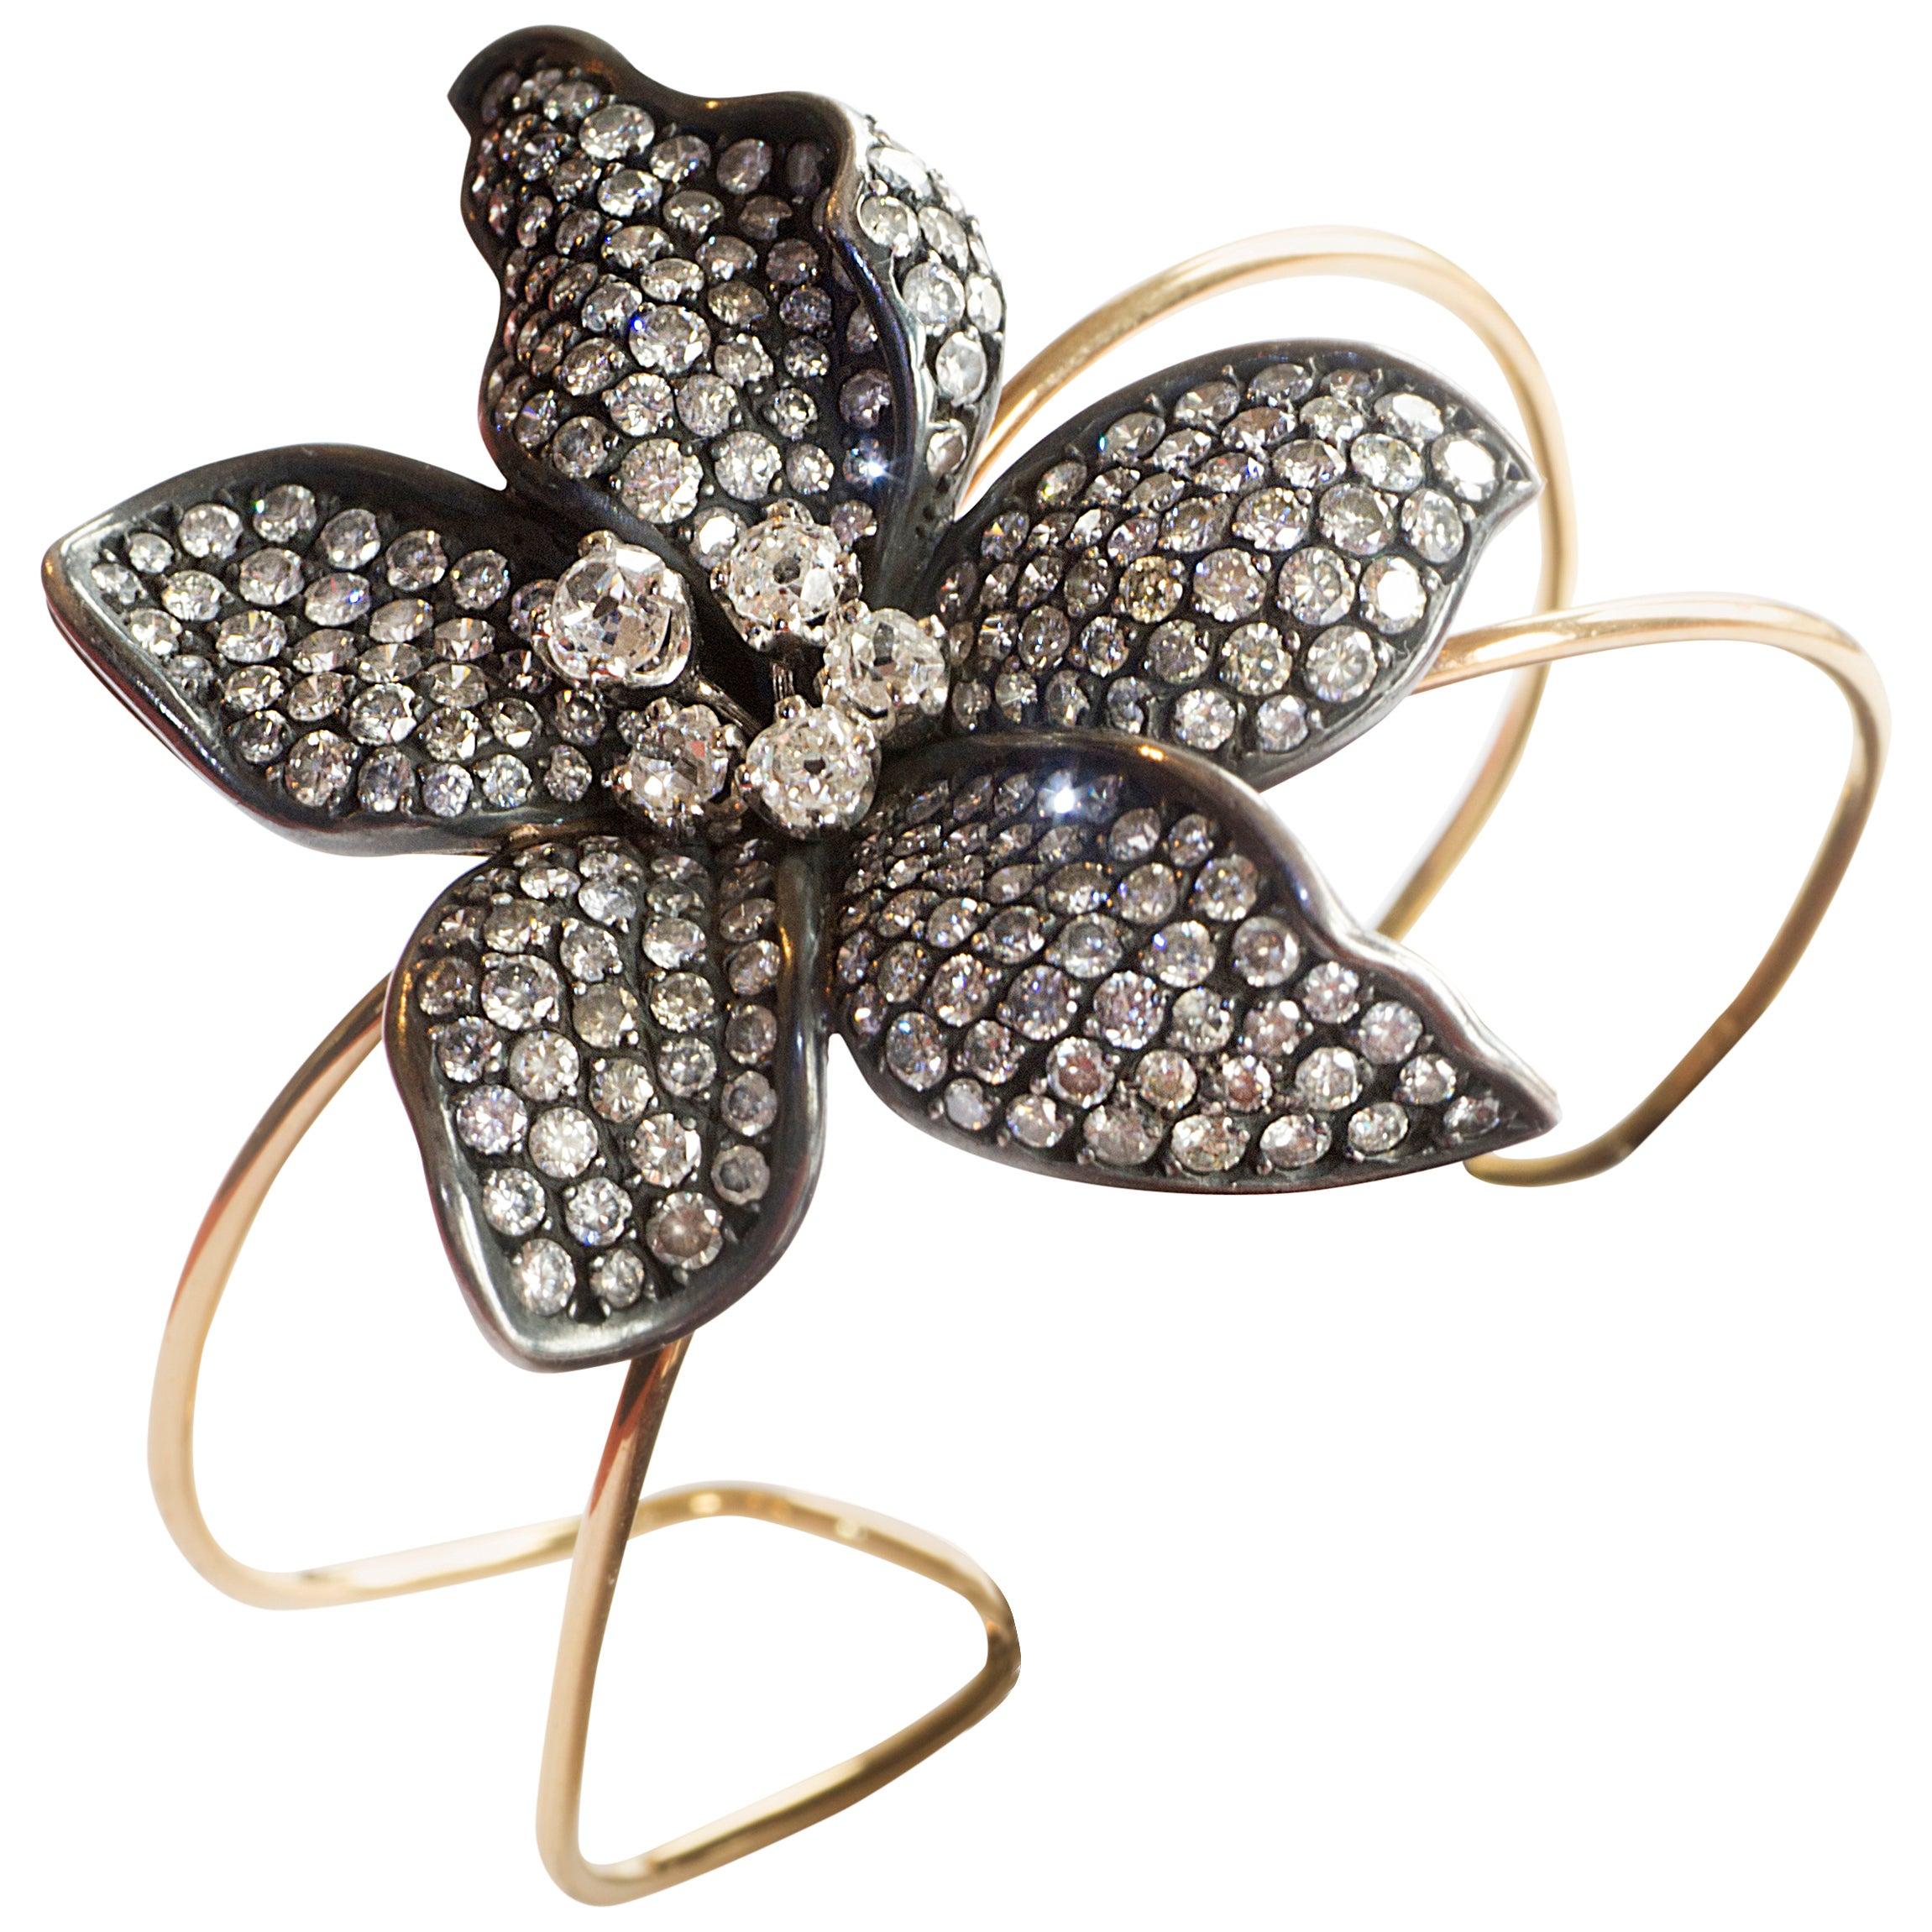 Unique Flower 18k Gold Bangle Bracelet Set With White and Grey Diamonds